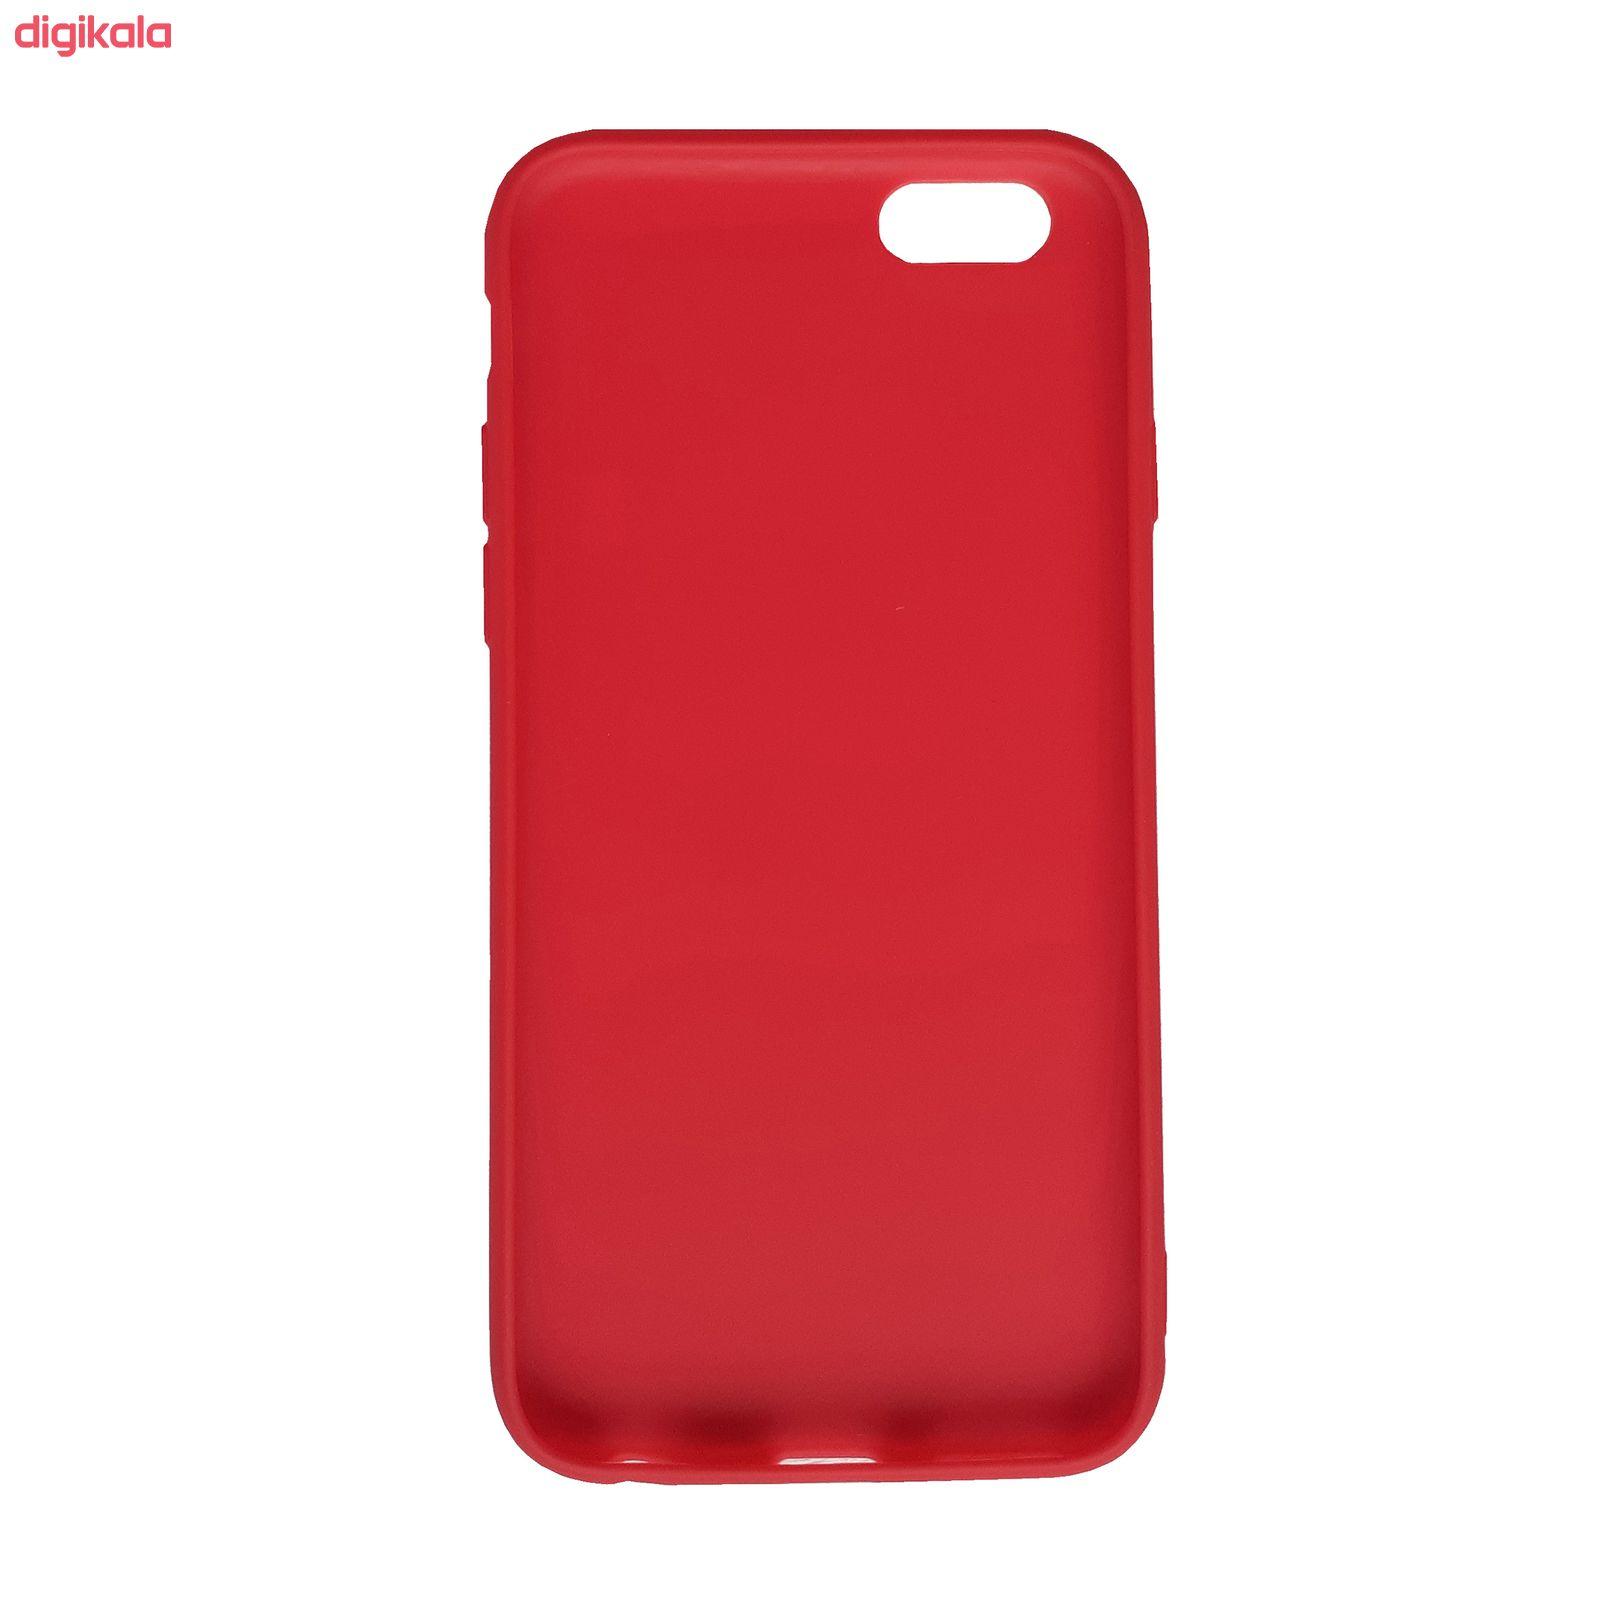 کاور مدل M-6G مناسب برای گوشی موبایل اپل iphone 6/6S main 1 7